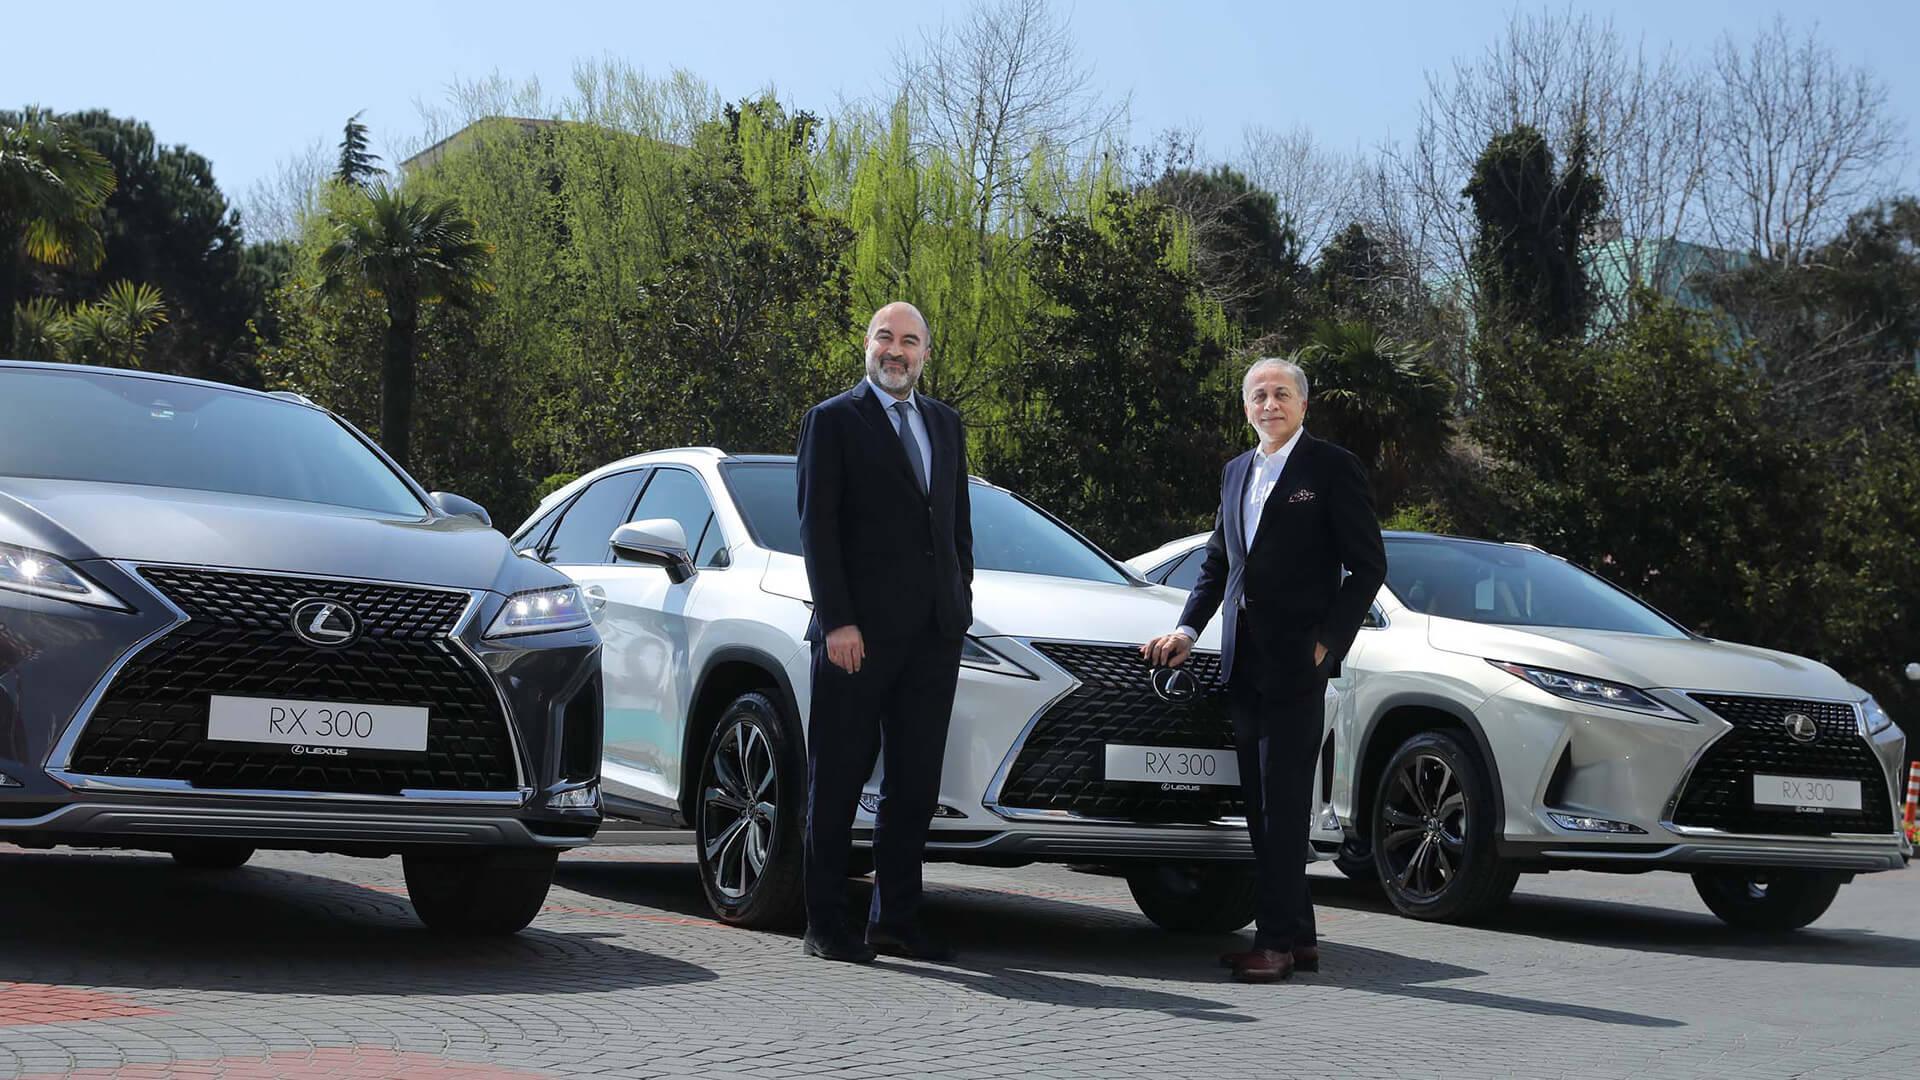 Dünyanın İlk Premium SUV'u Lexus RX gallery02